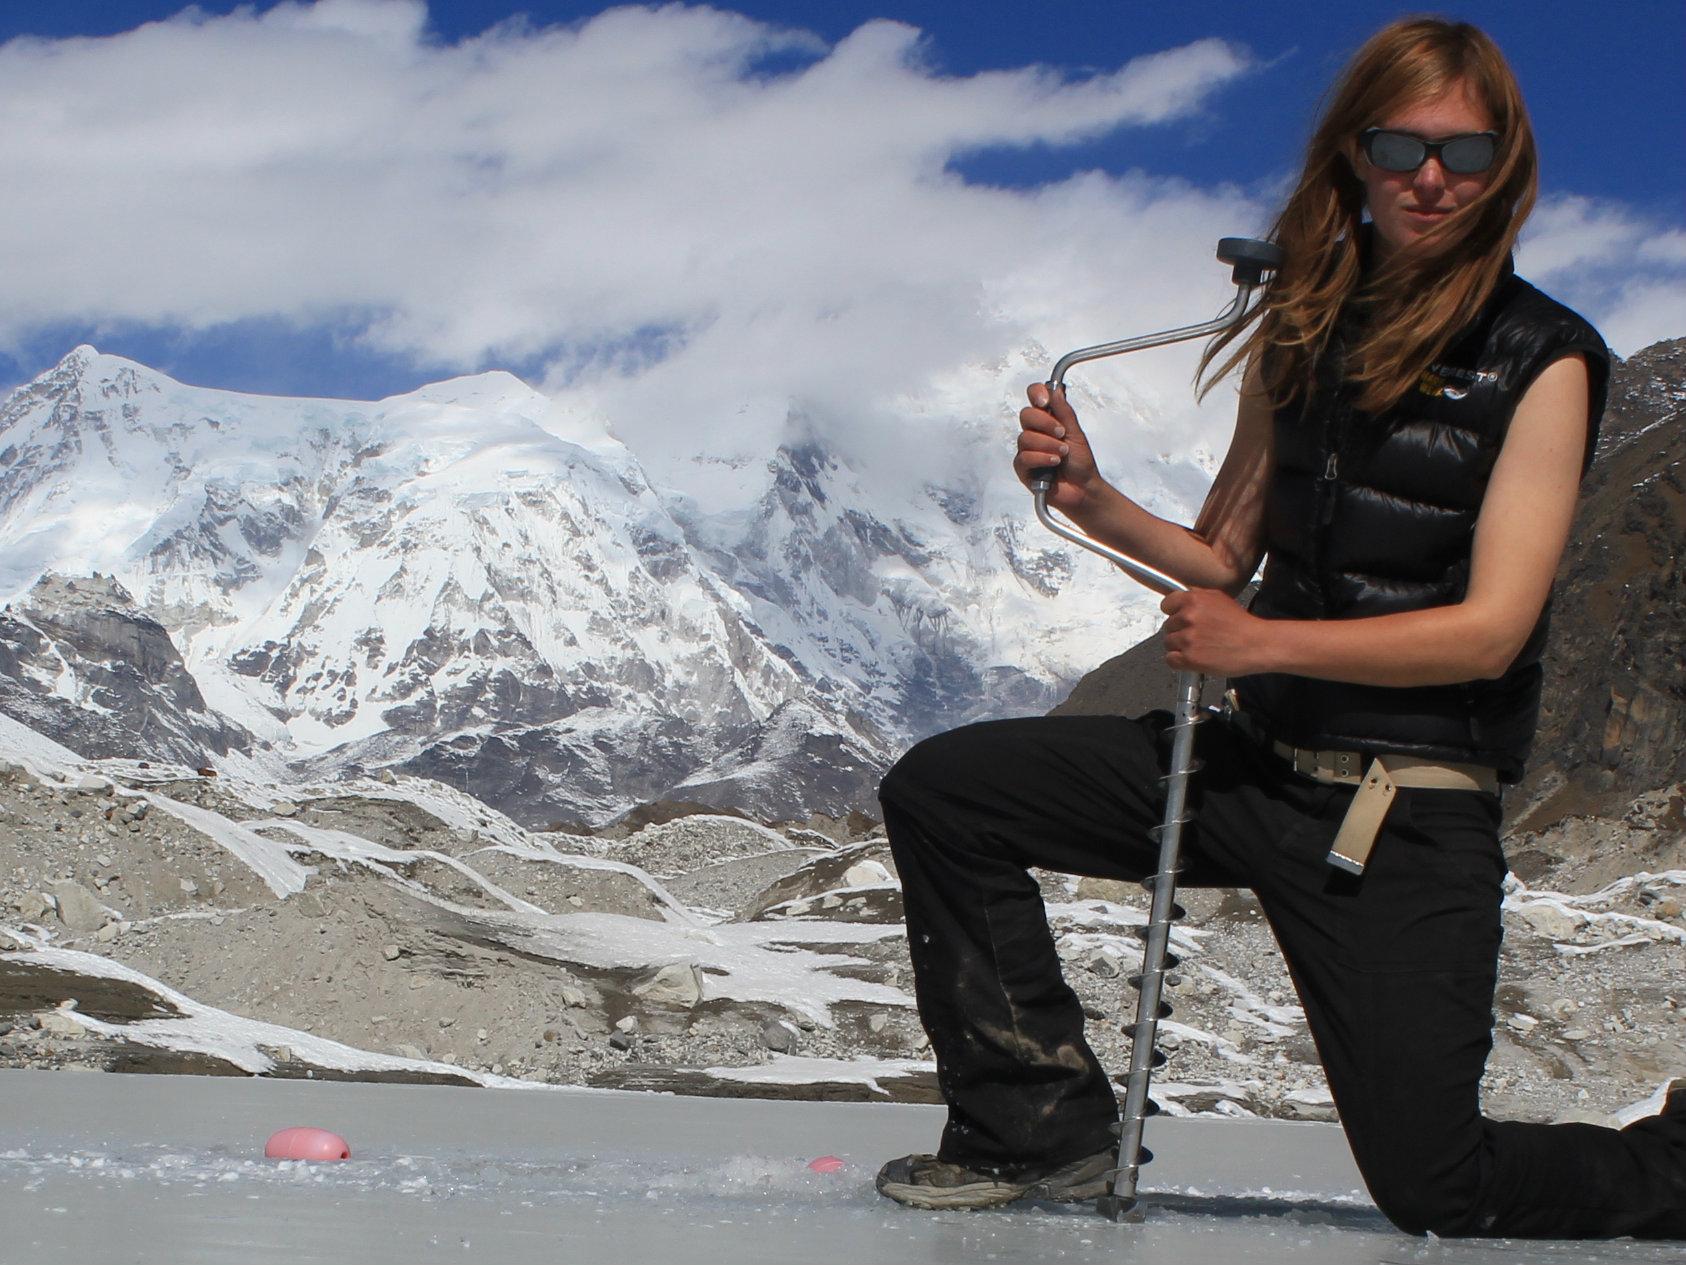 <p>Ulyana Horodyskyj drilling on a glacial ice lake to retrieve sensors on the Ngozumpa glacier in Nepal.</p>